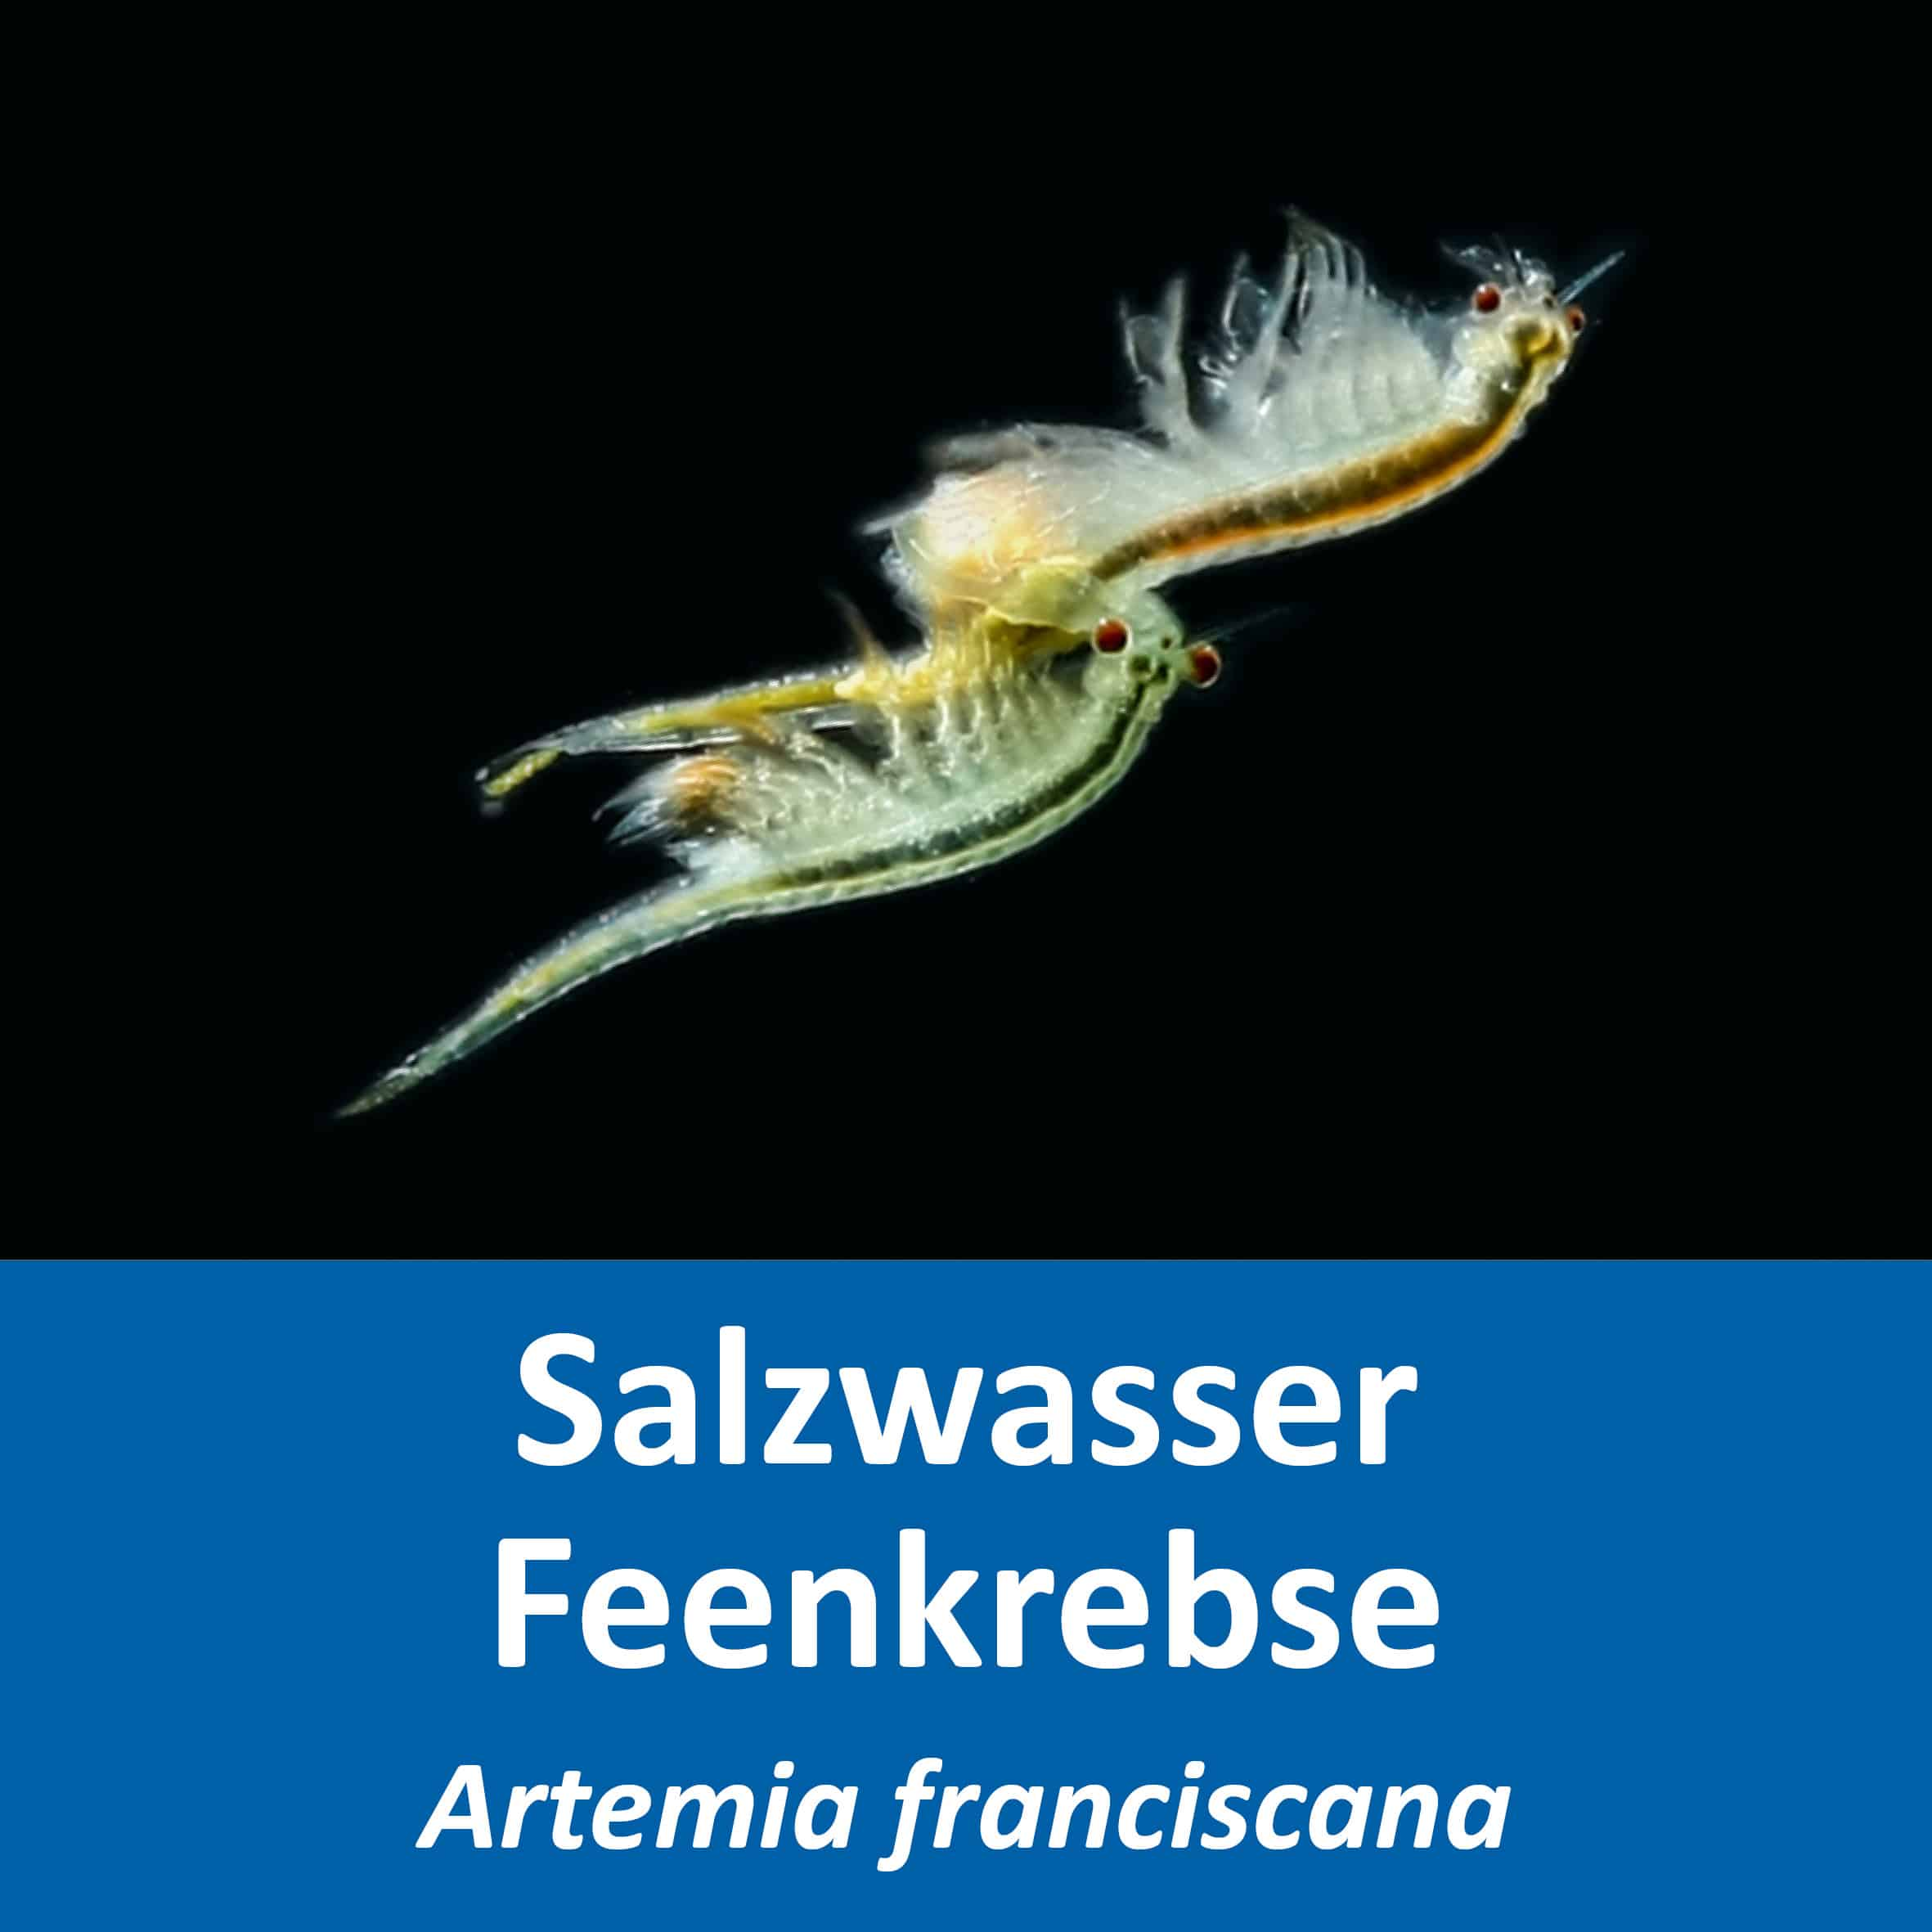 Artemia franciscana